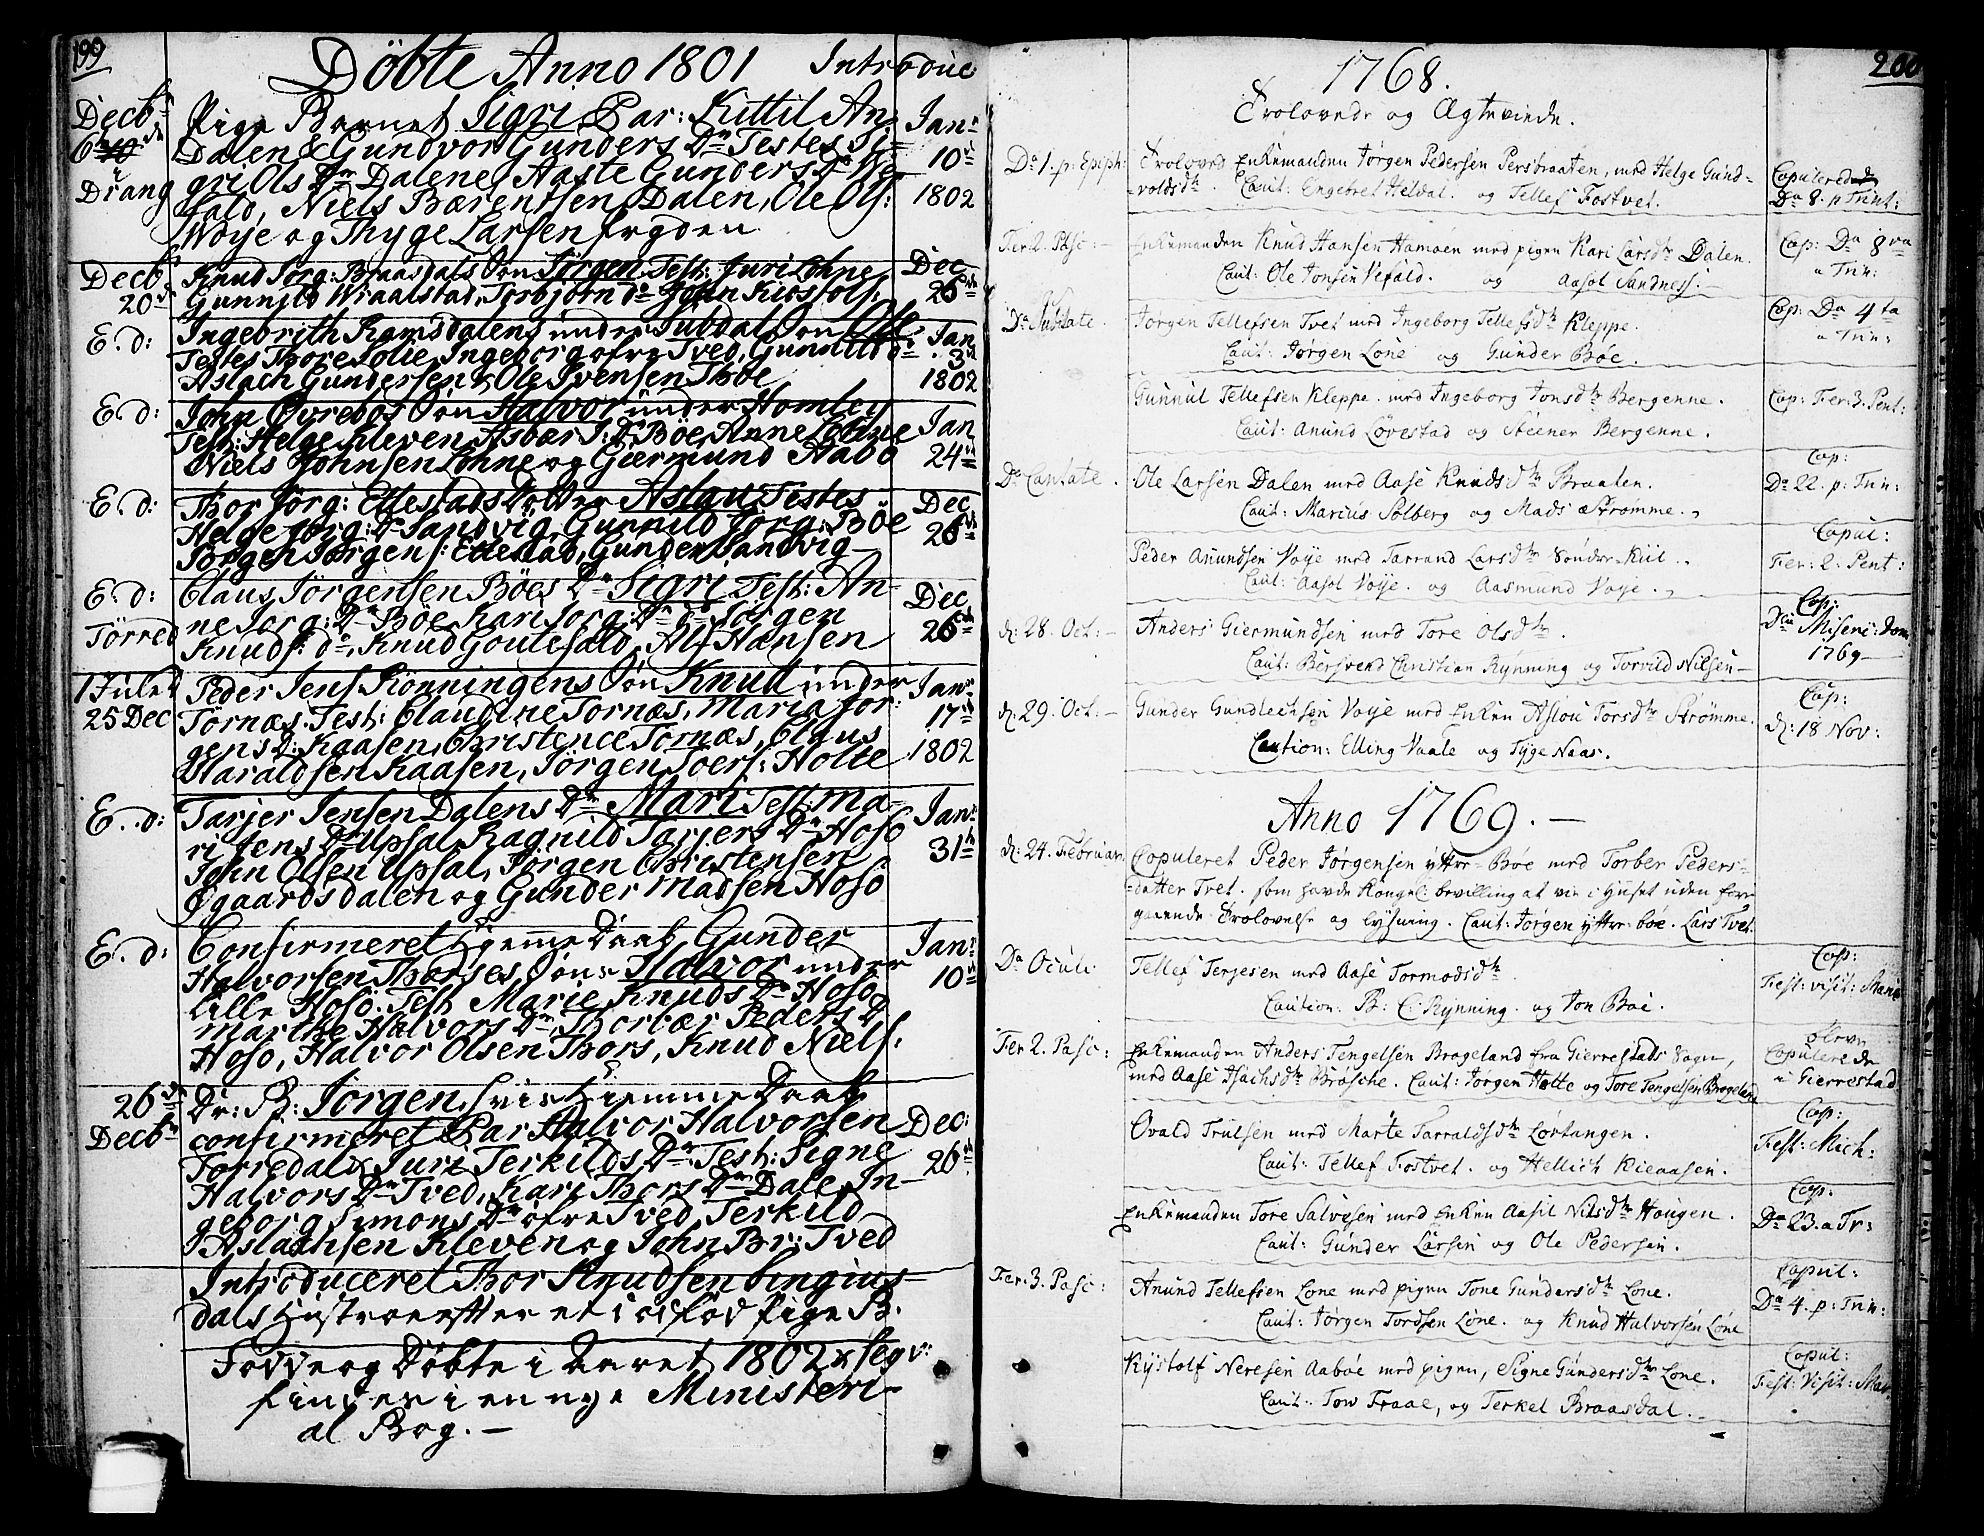 SAKO, Drangedal kirkebøker, F/Fa/L0003: Ministerialbok nr. 3, 1768-1814, s. 199-200